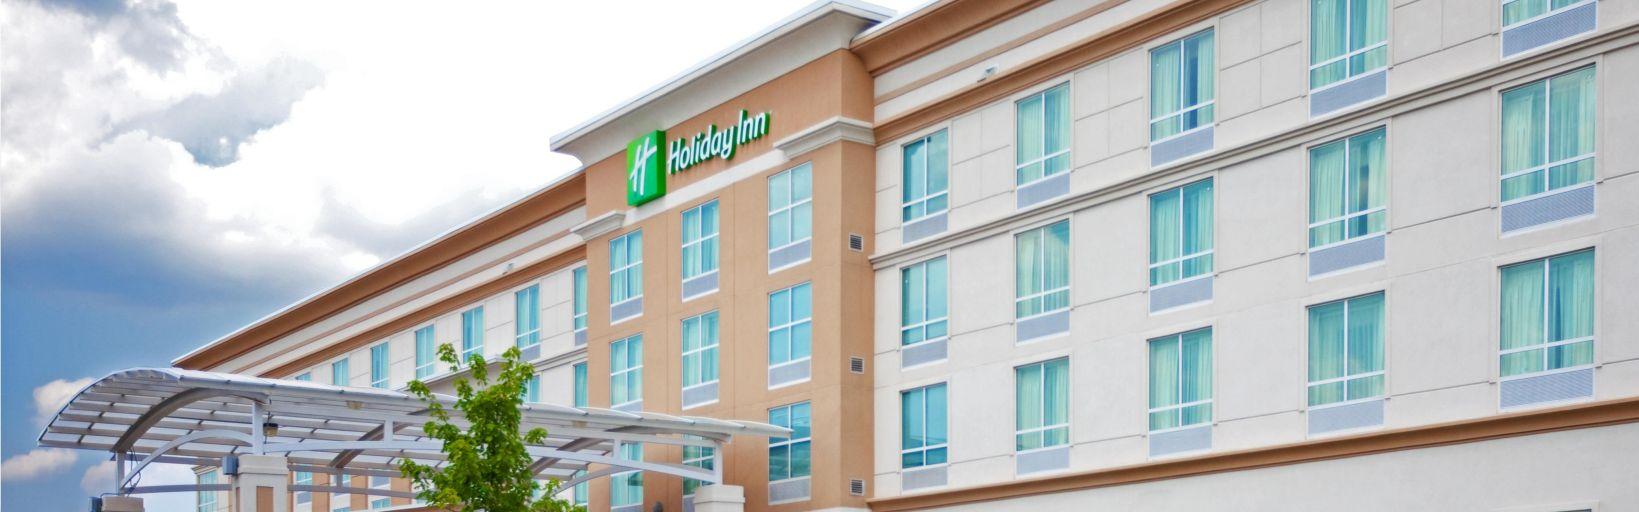 Holiday Inn Manassas Battlefield Hotel By Ihg Sabre Garden Tractor Lights Wiring Front Desk Battlefield39s Award Winning Exterior